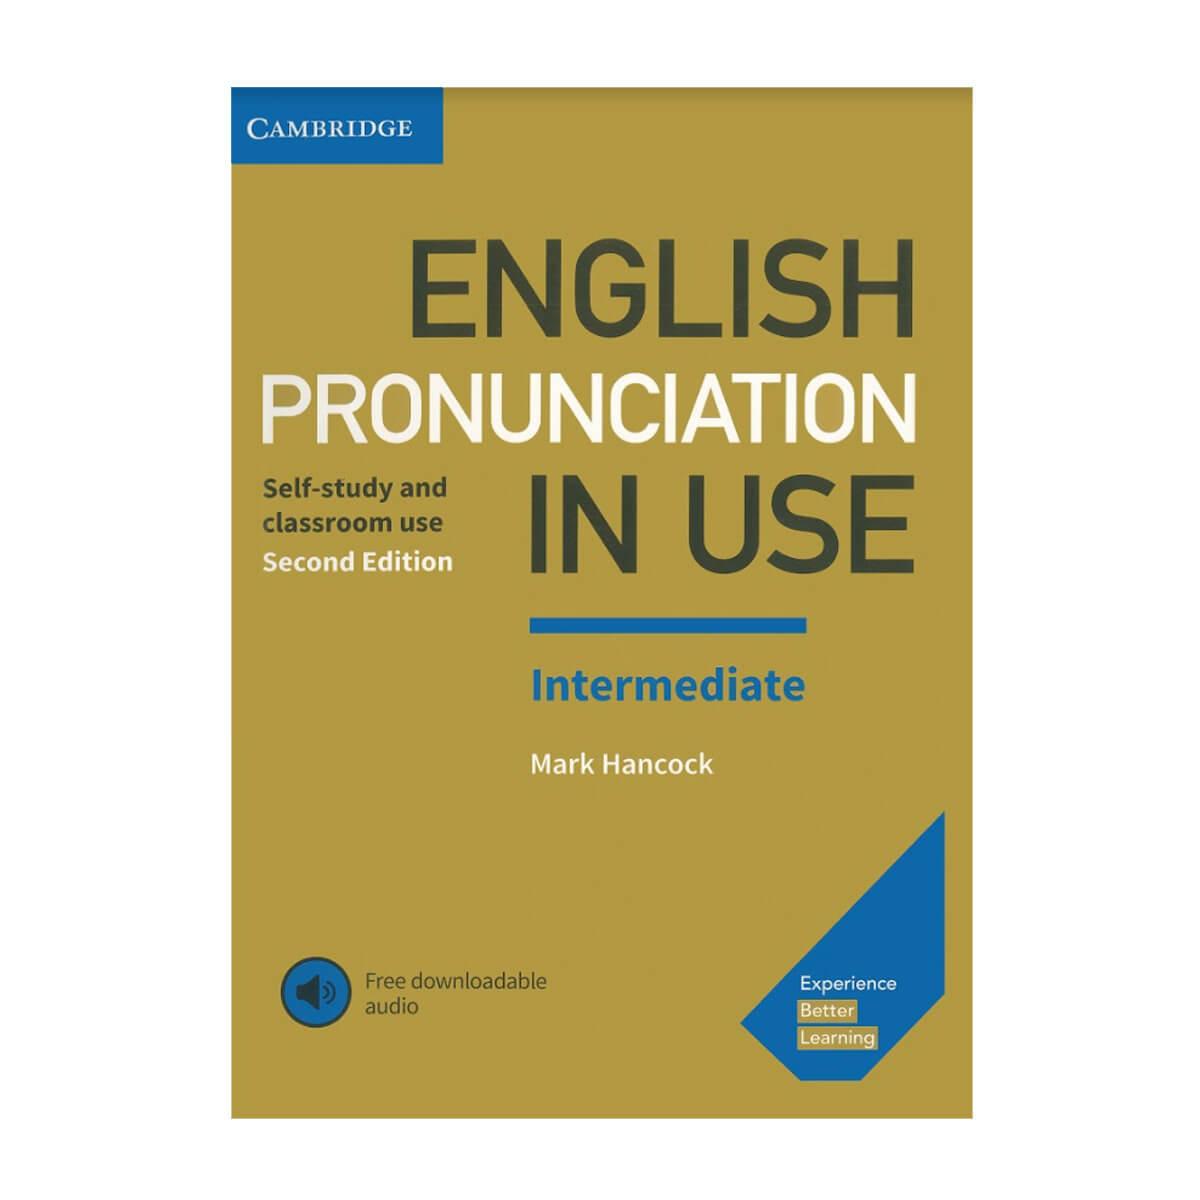 Sách] Cambridge English Pronunciation In Use - 2nd Editon: Intermediate (In Đen Trắng) - Siêu Mọt Sách